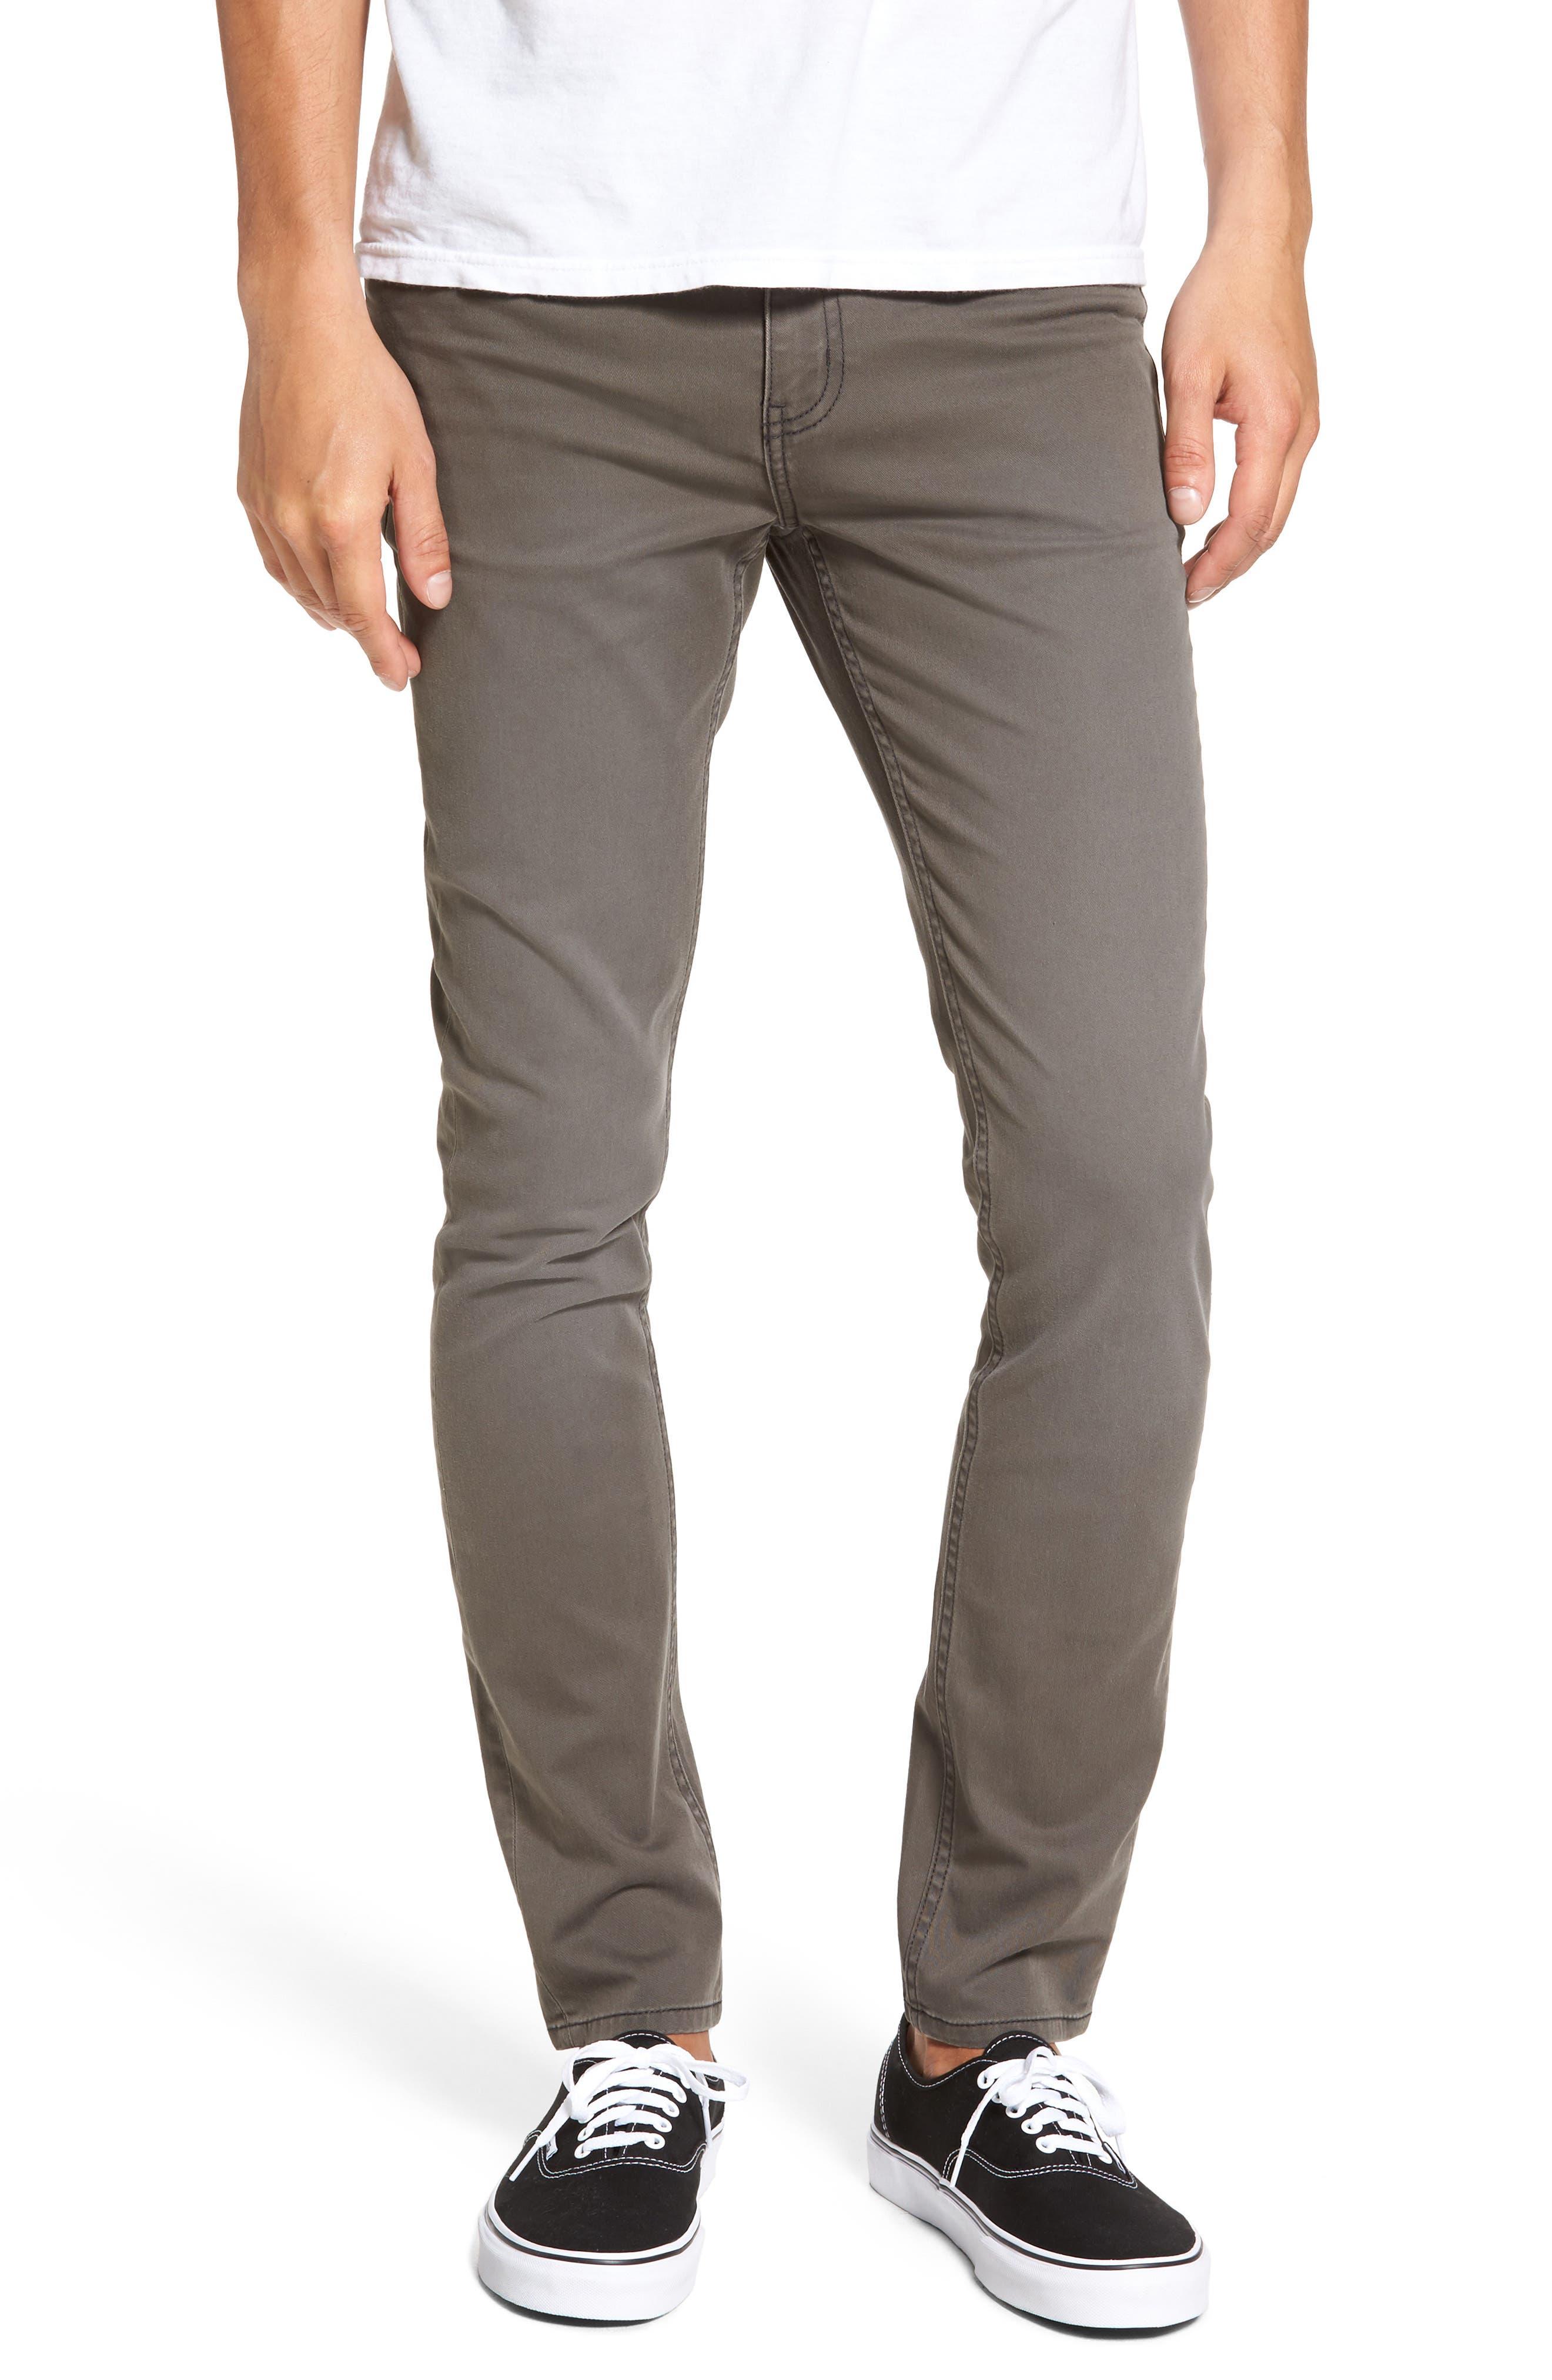 Main Image - Cheap Monday Tight Skinny Fit Jeans (Paper Khaki)